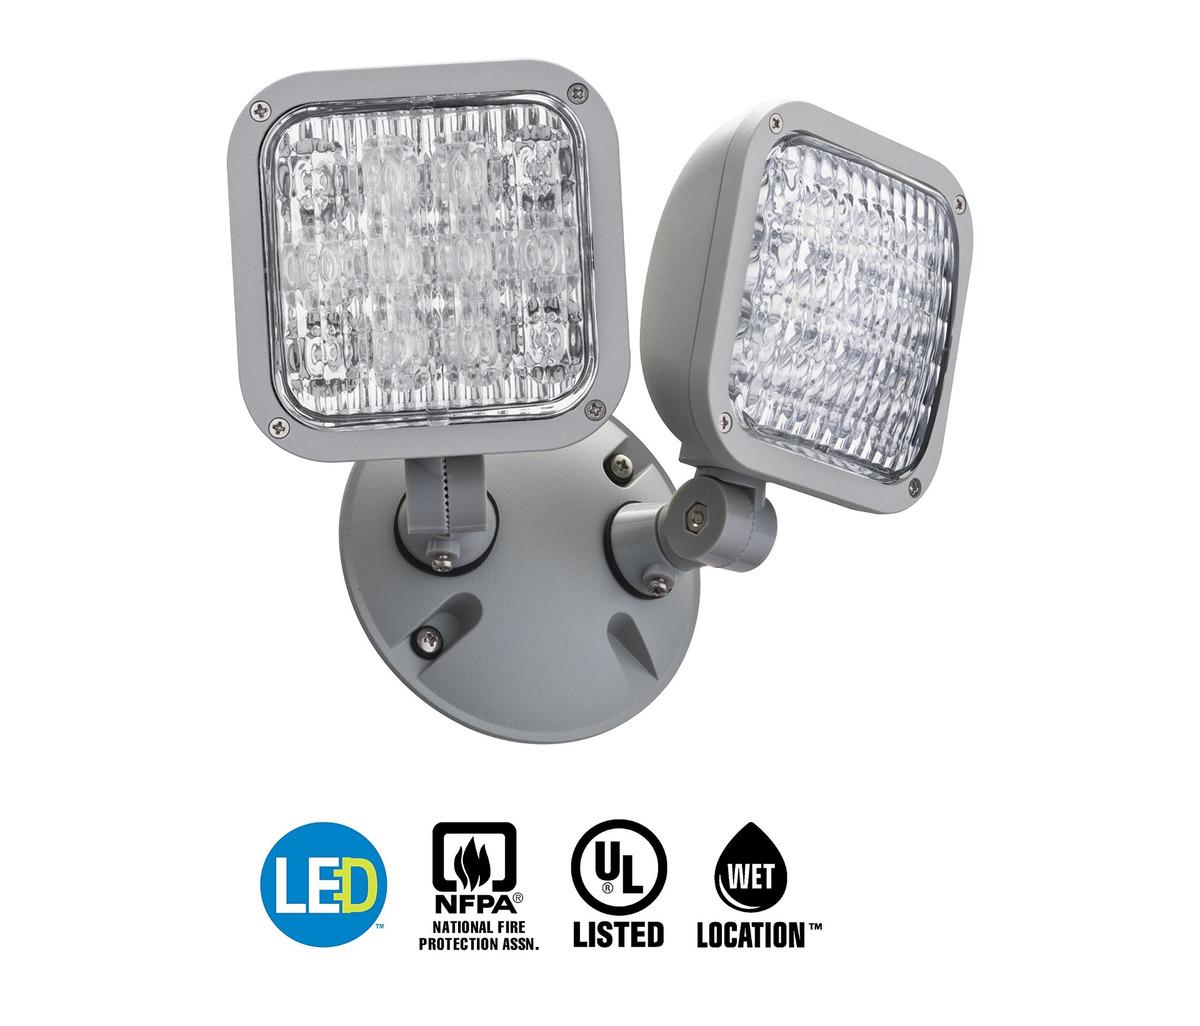 Lithonia Lighting Ela Led T Wp M12 Led Emergency Remote Doub 296 900 En Mercado Libre